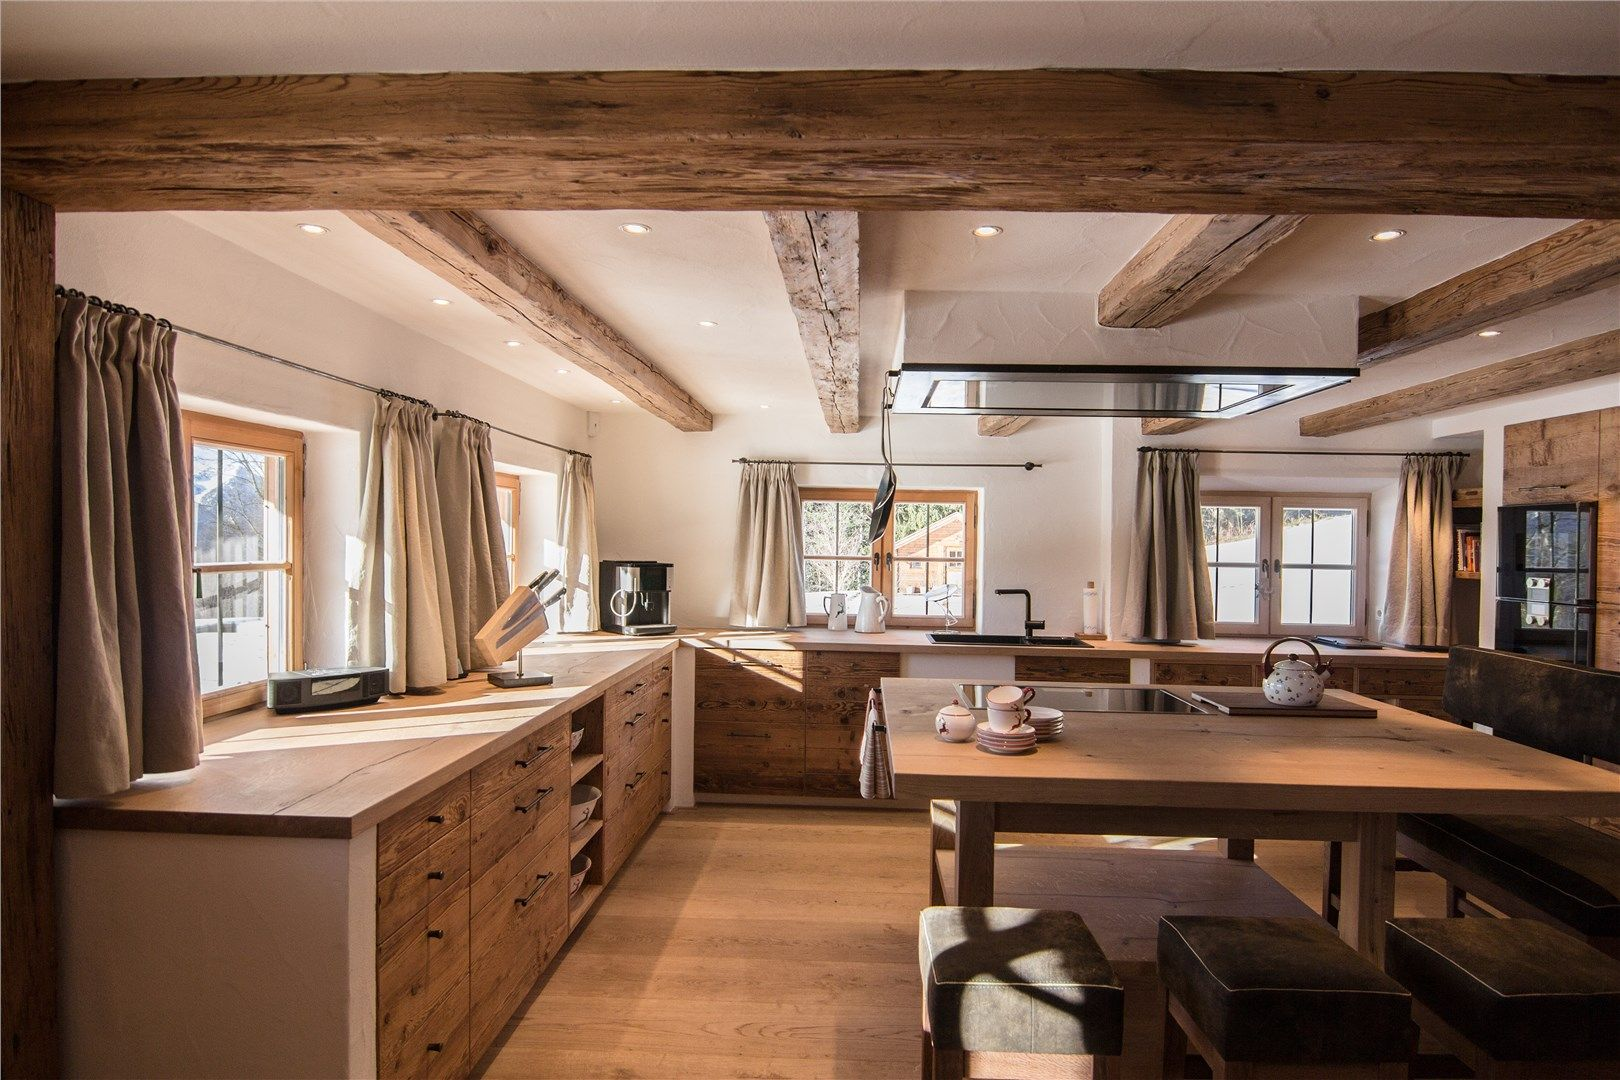 bauernk che recherche google farm house kitchen. Black Bedroom Furniture Sets. Home Design Ideas